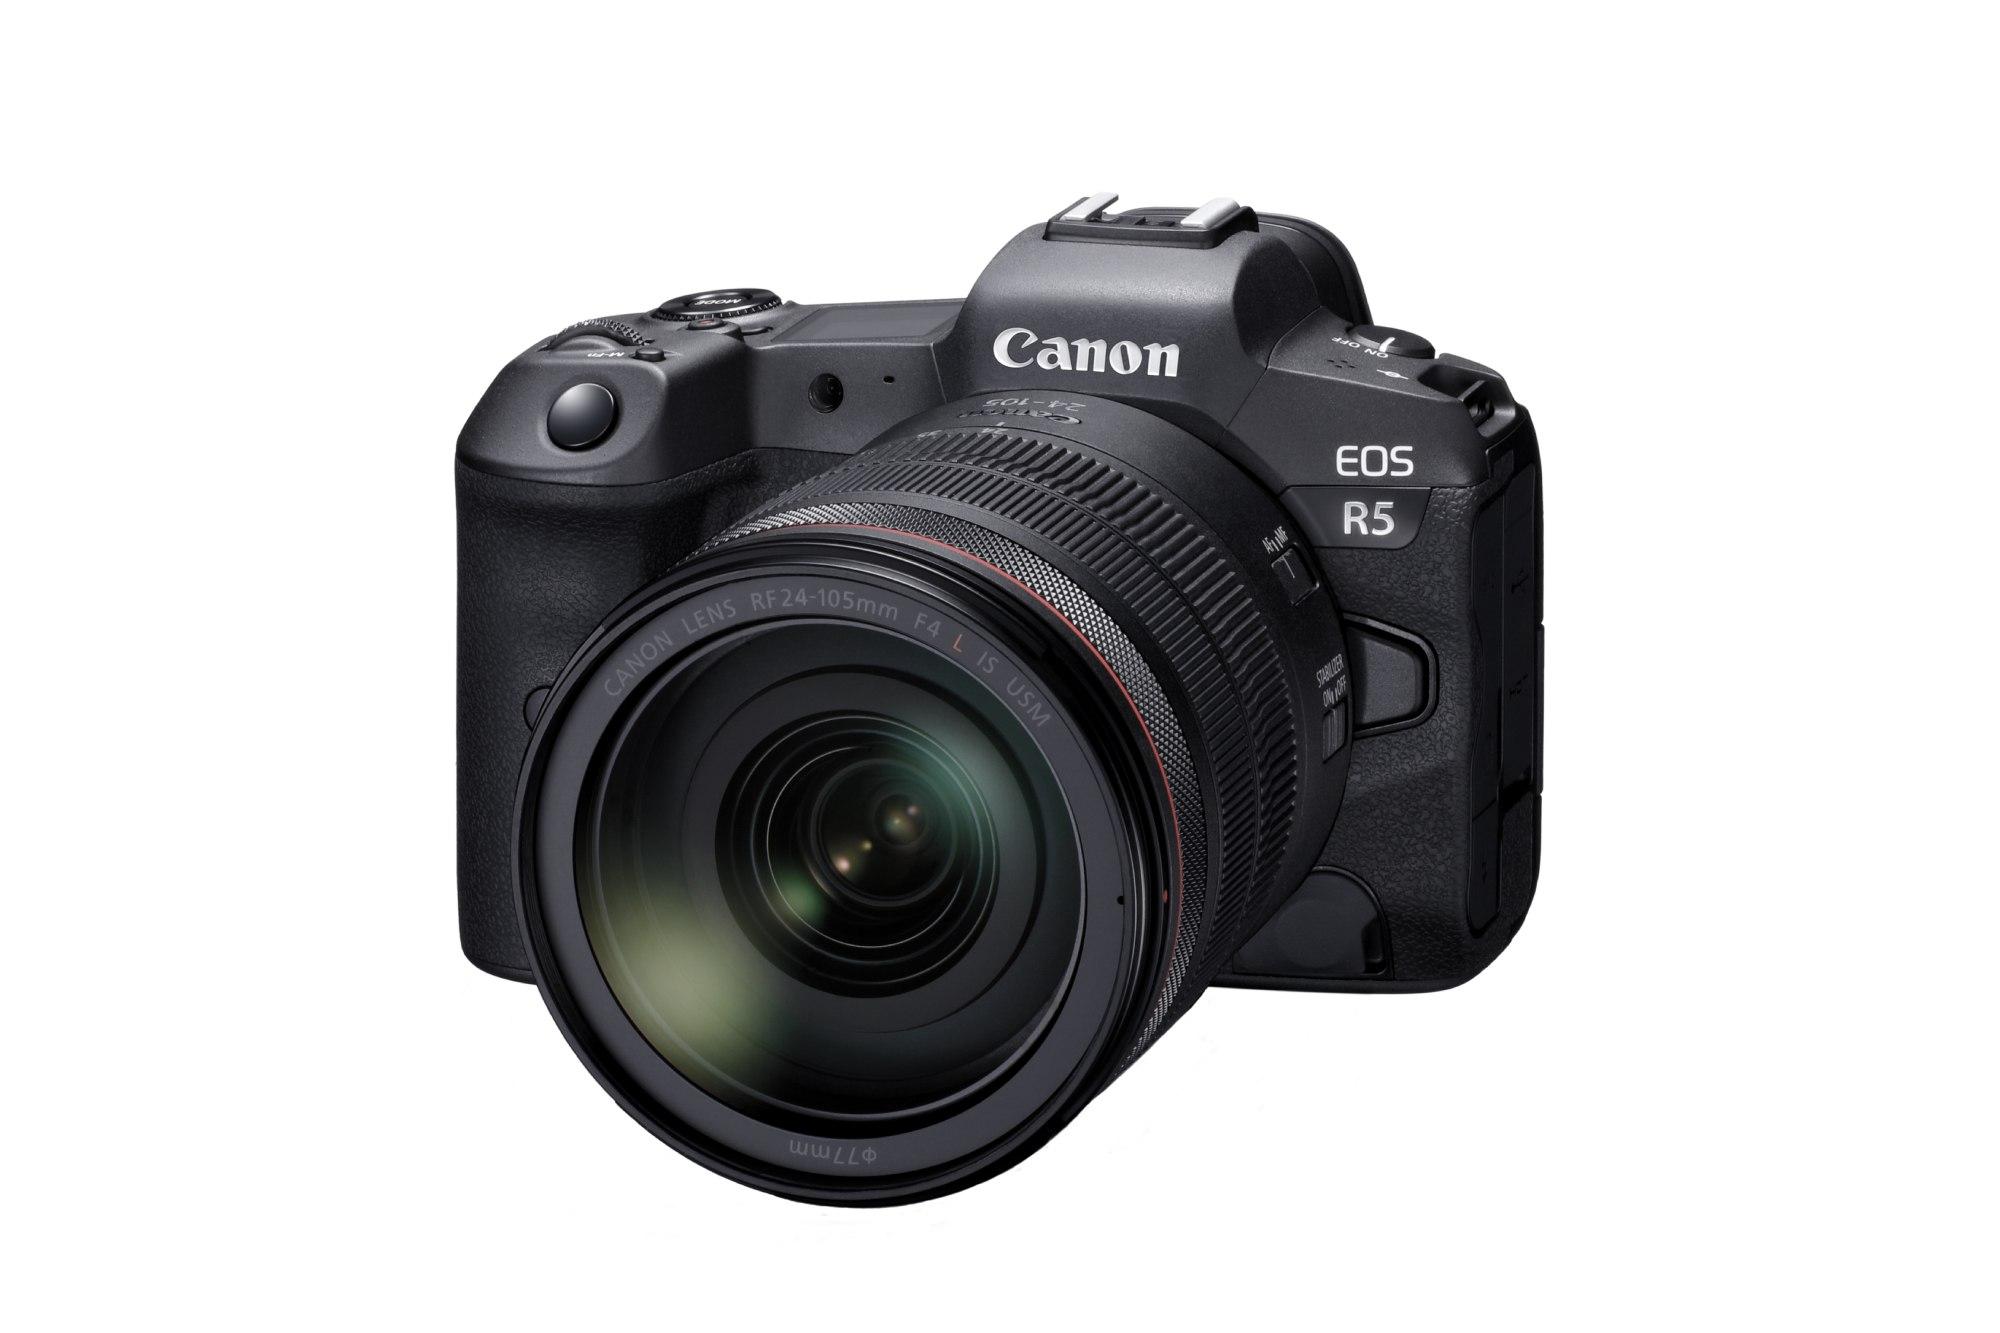 canon eos r5 rumors confirmed